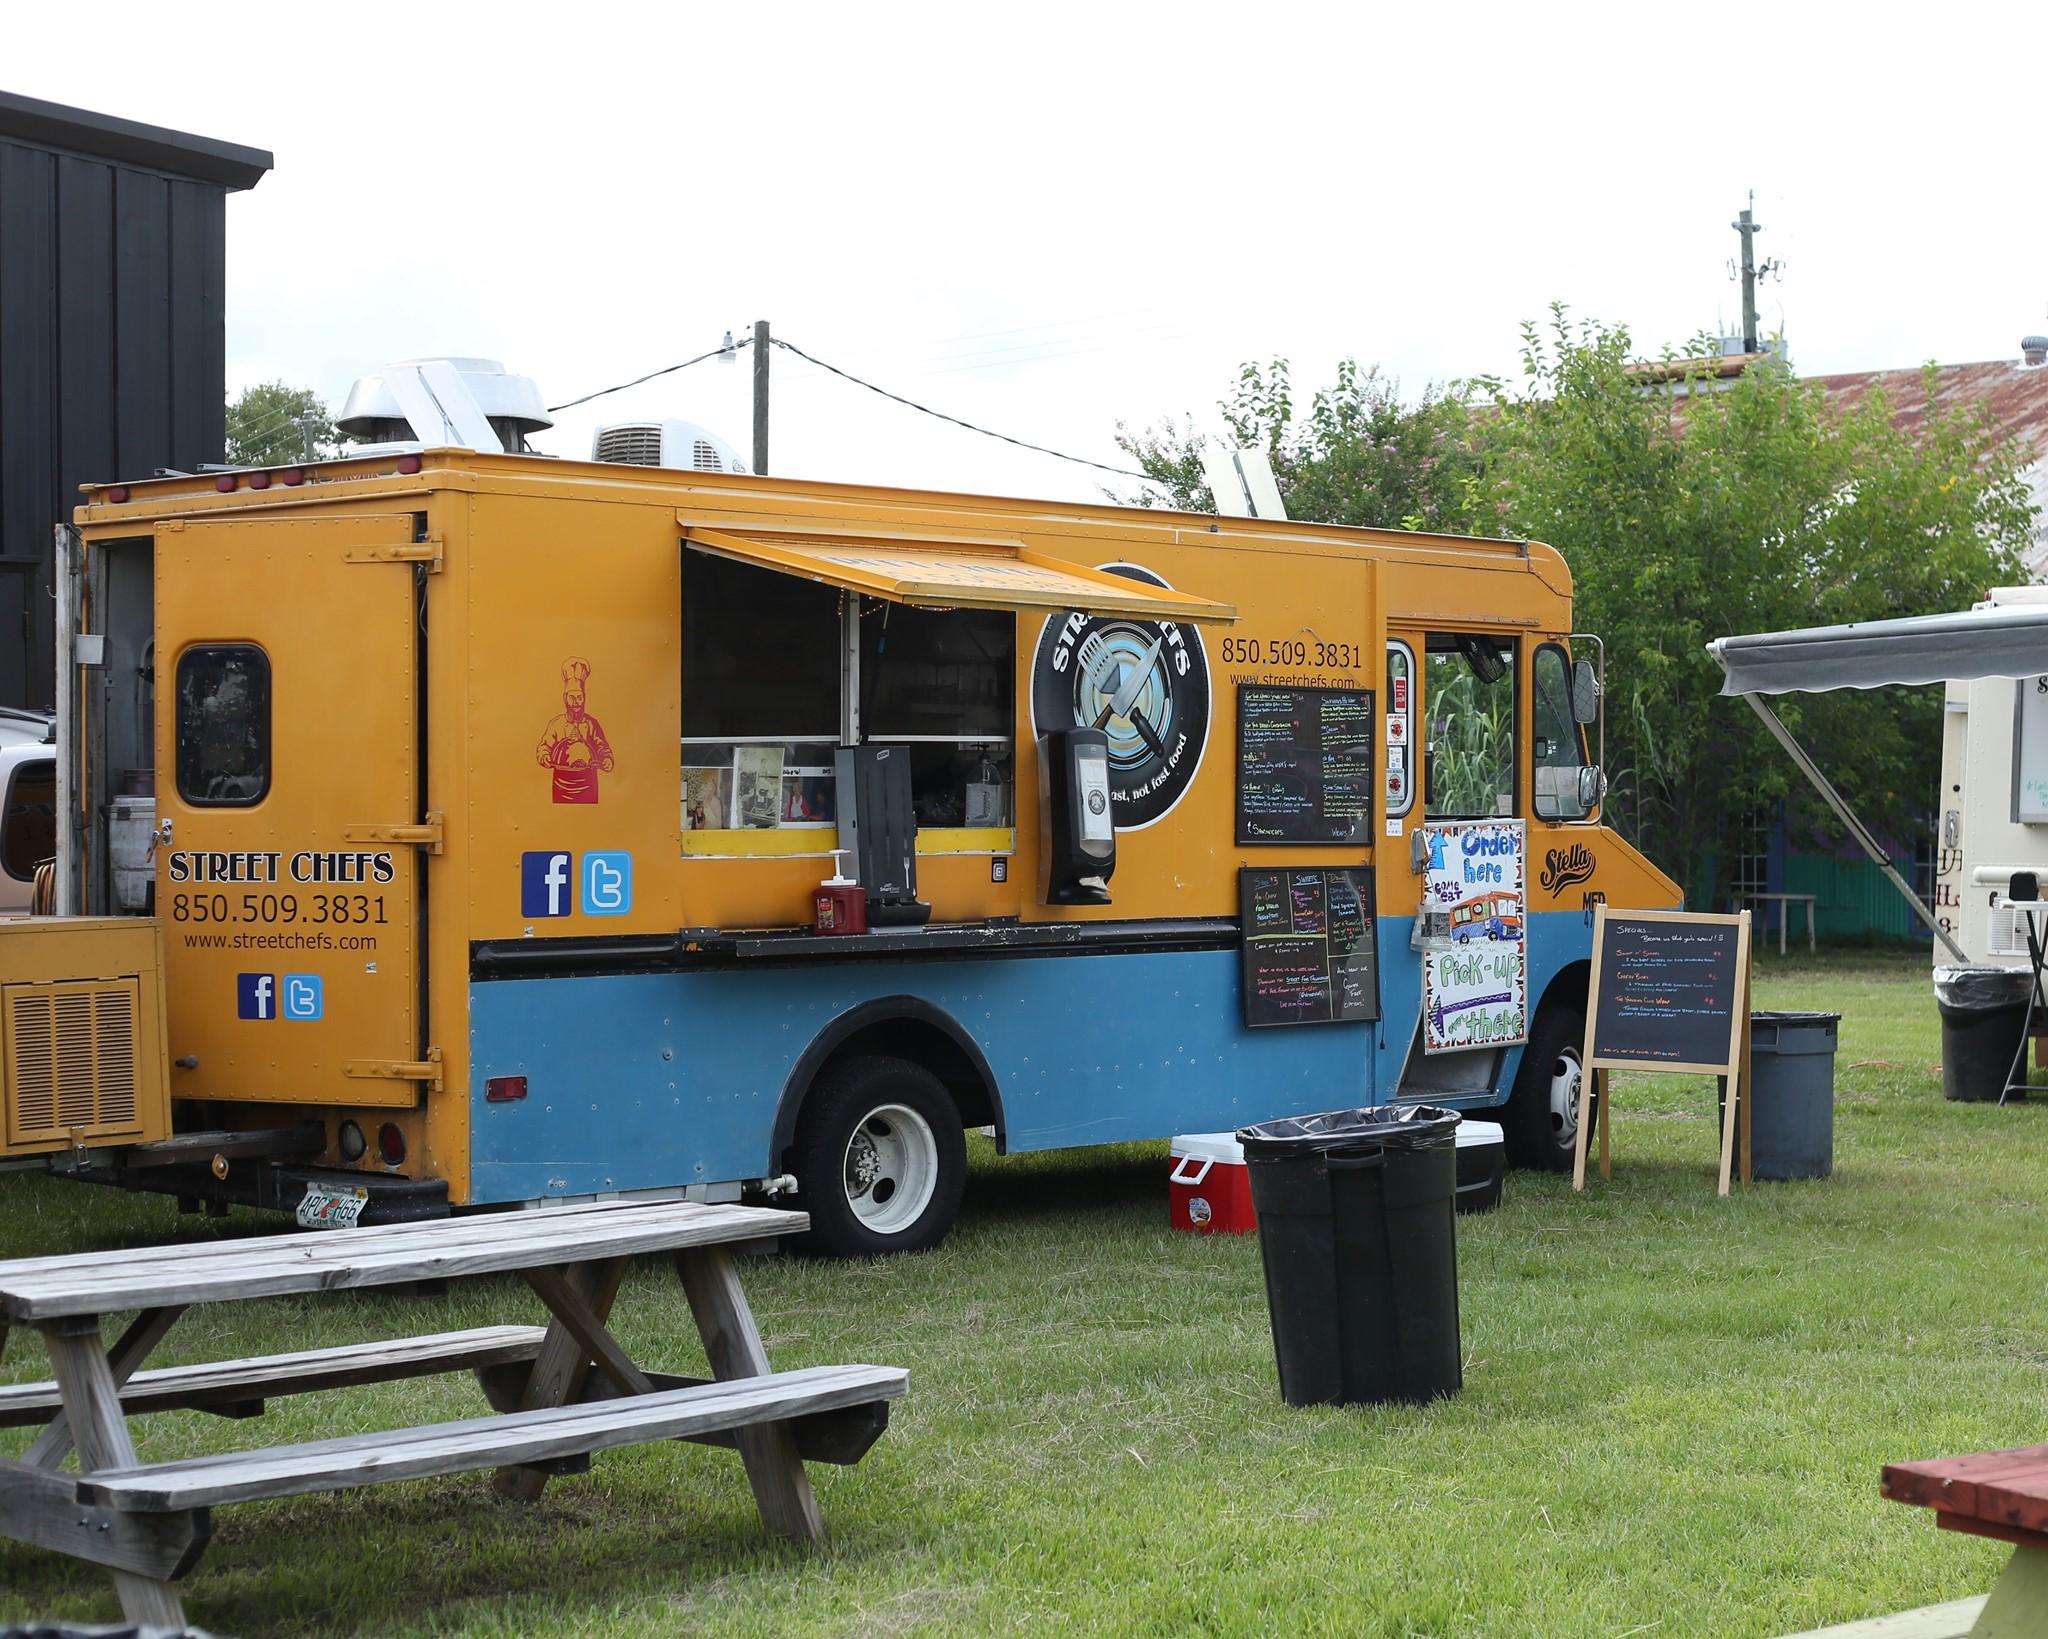 street chefs food truck